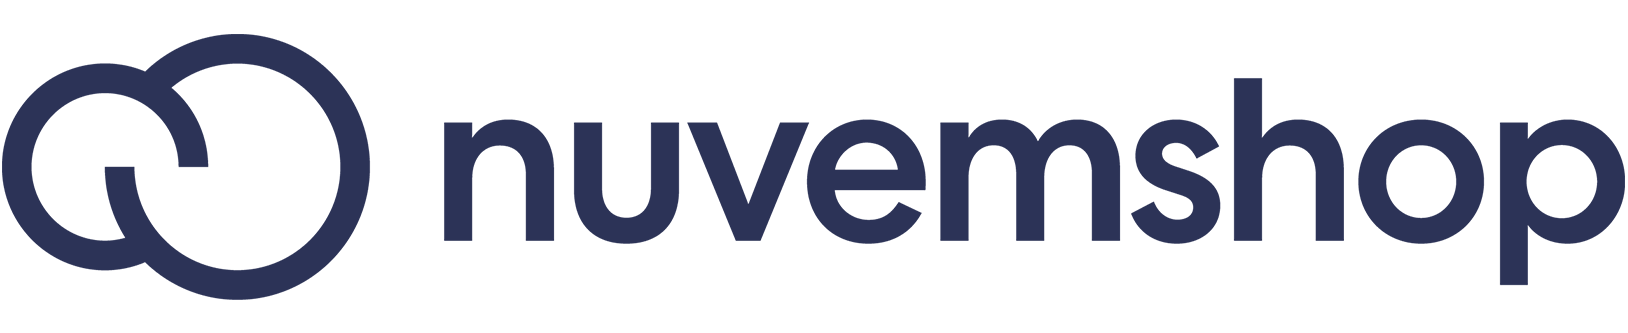 Nuvemshop - Sua marca, sua loja virtual